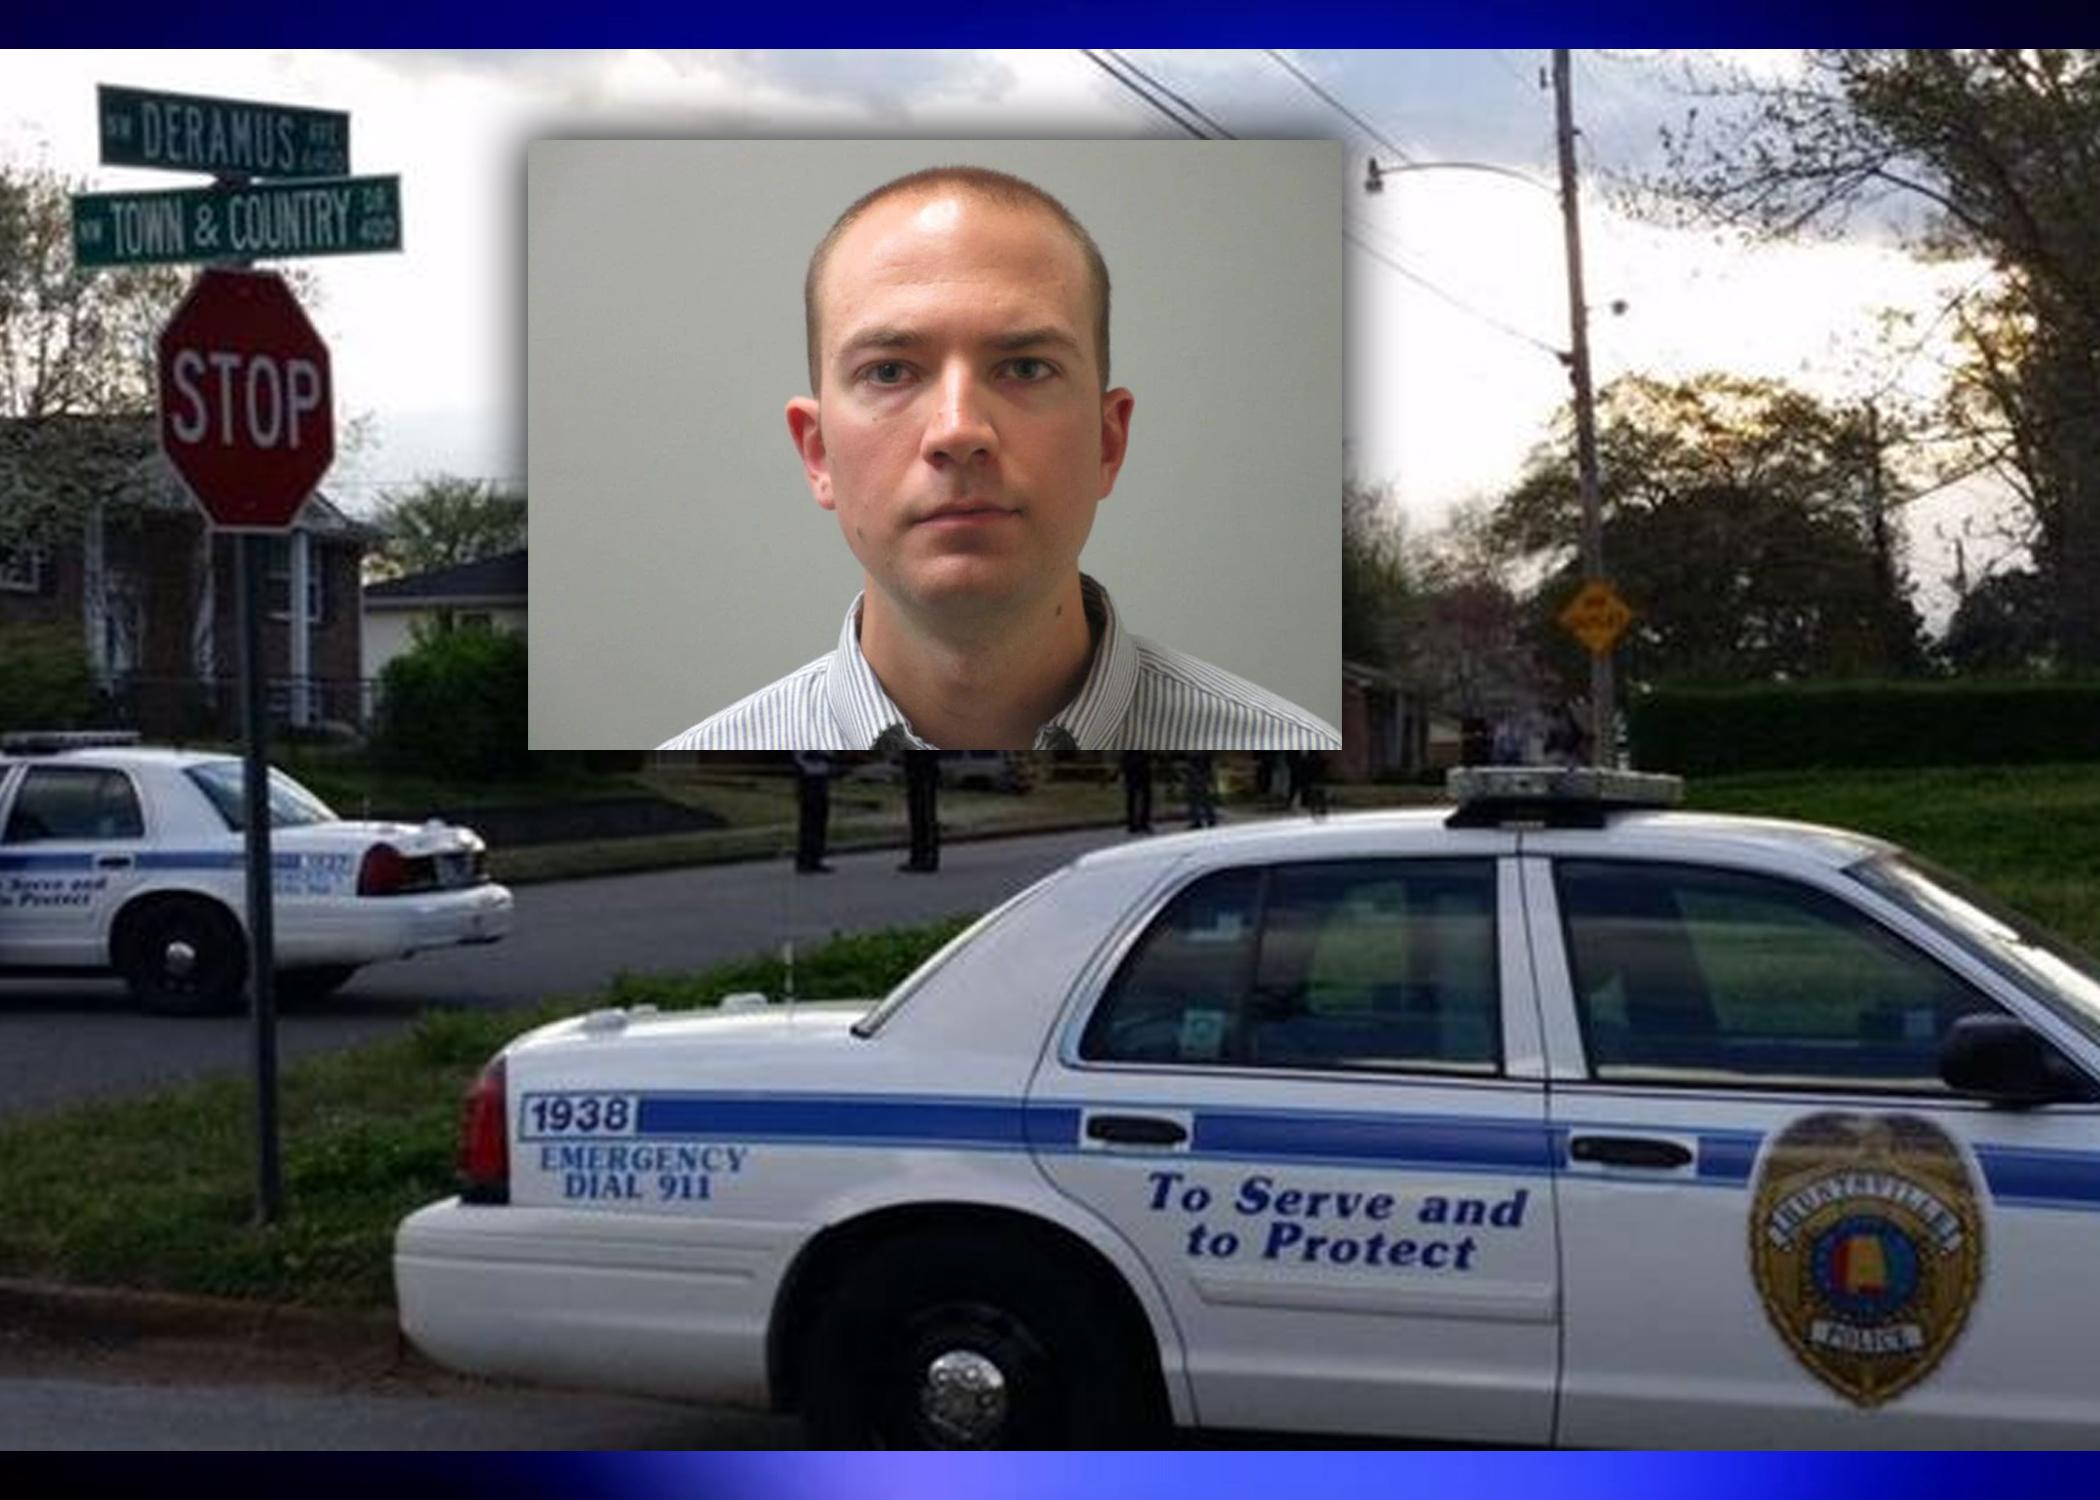 Jury views video of Alabama officer shooting suicidal man